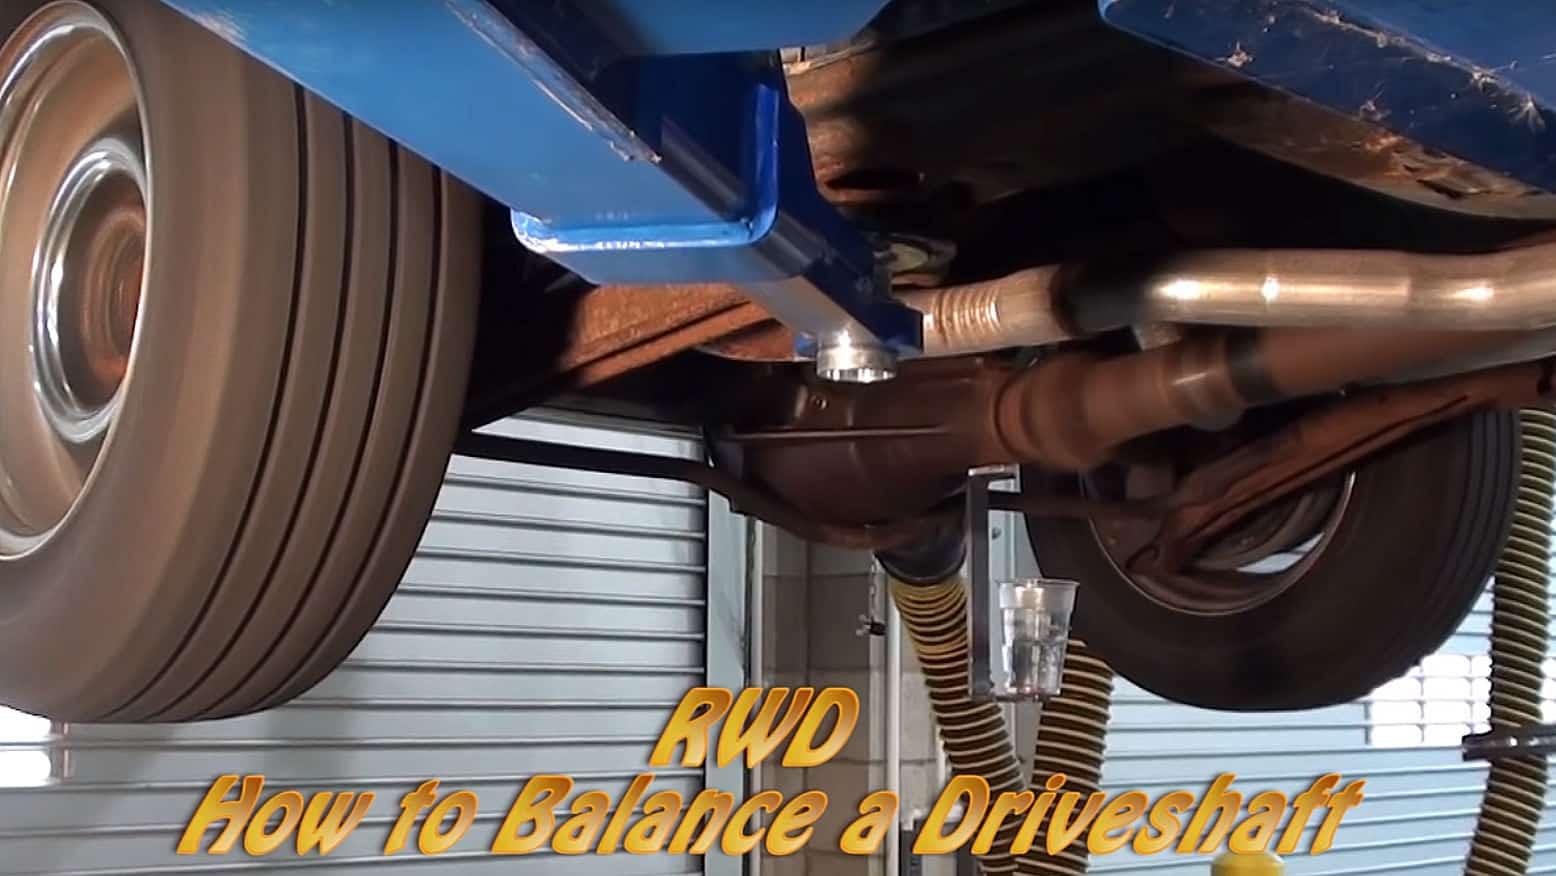 Driveshaft Balancing Near Me >> How To Balance A Driveshaft Driveline Master